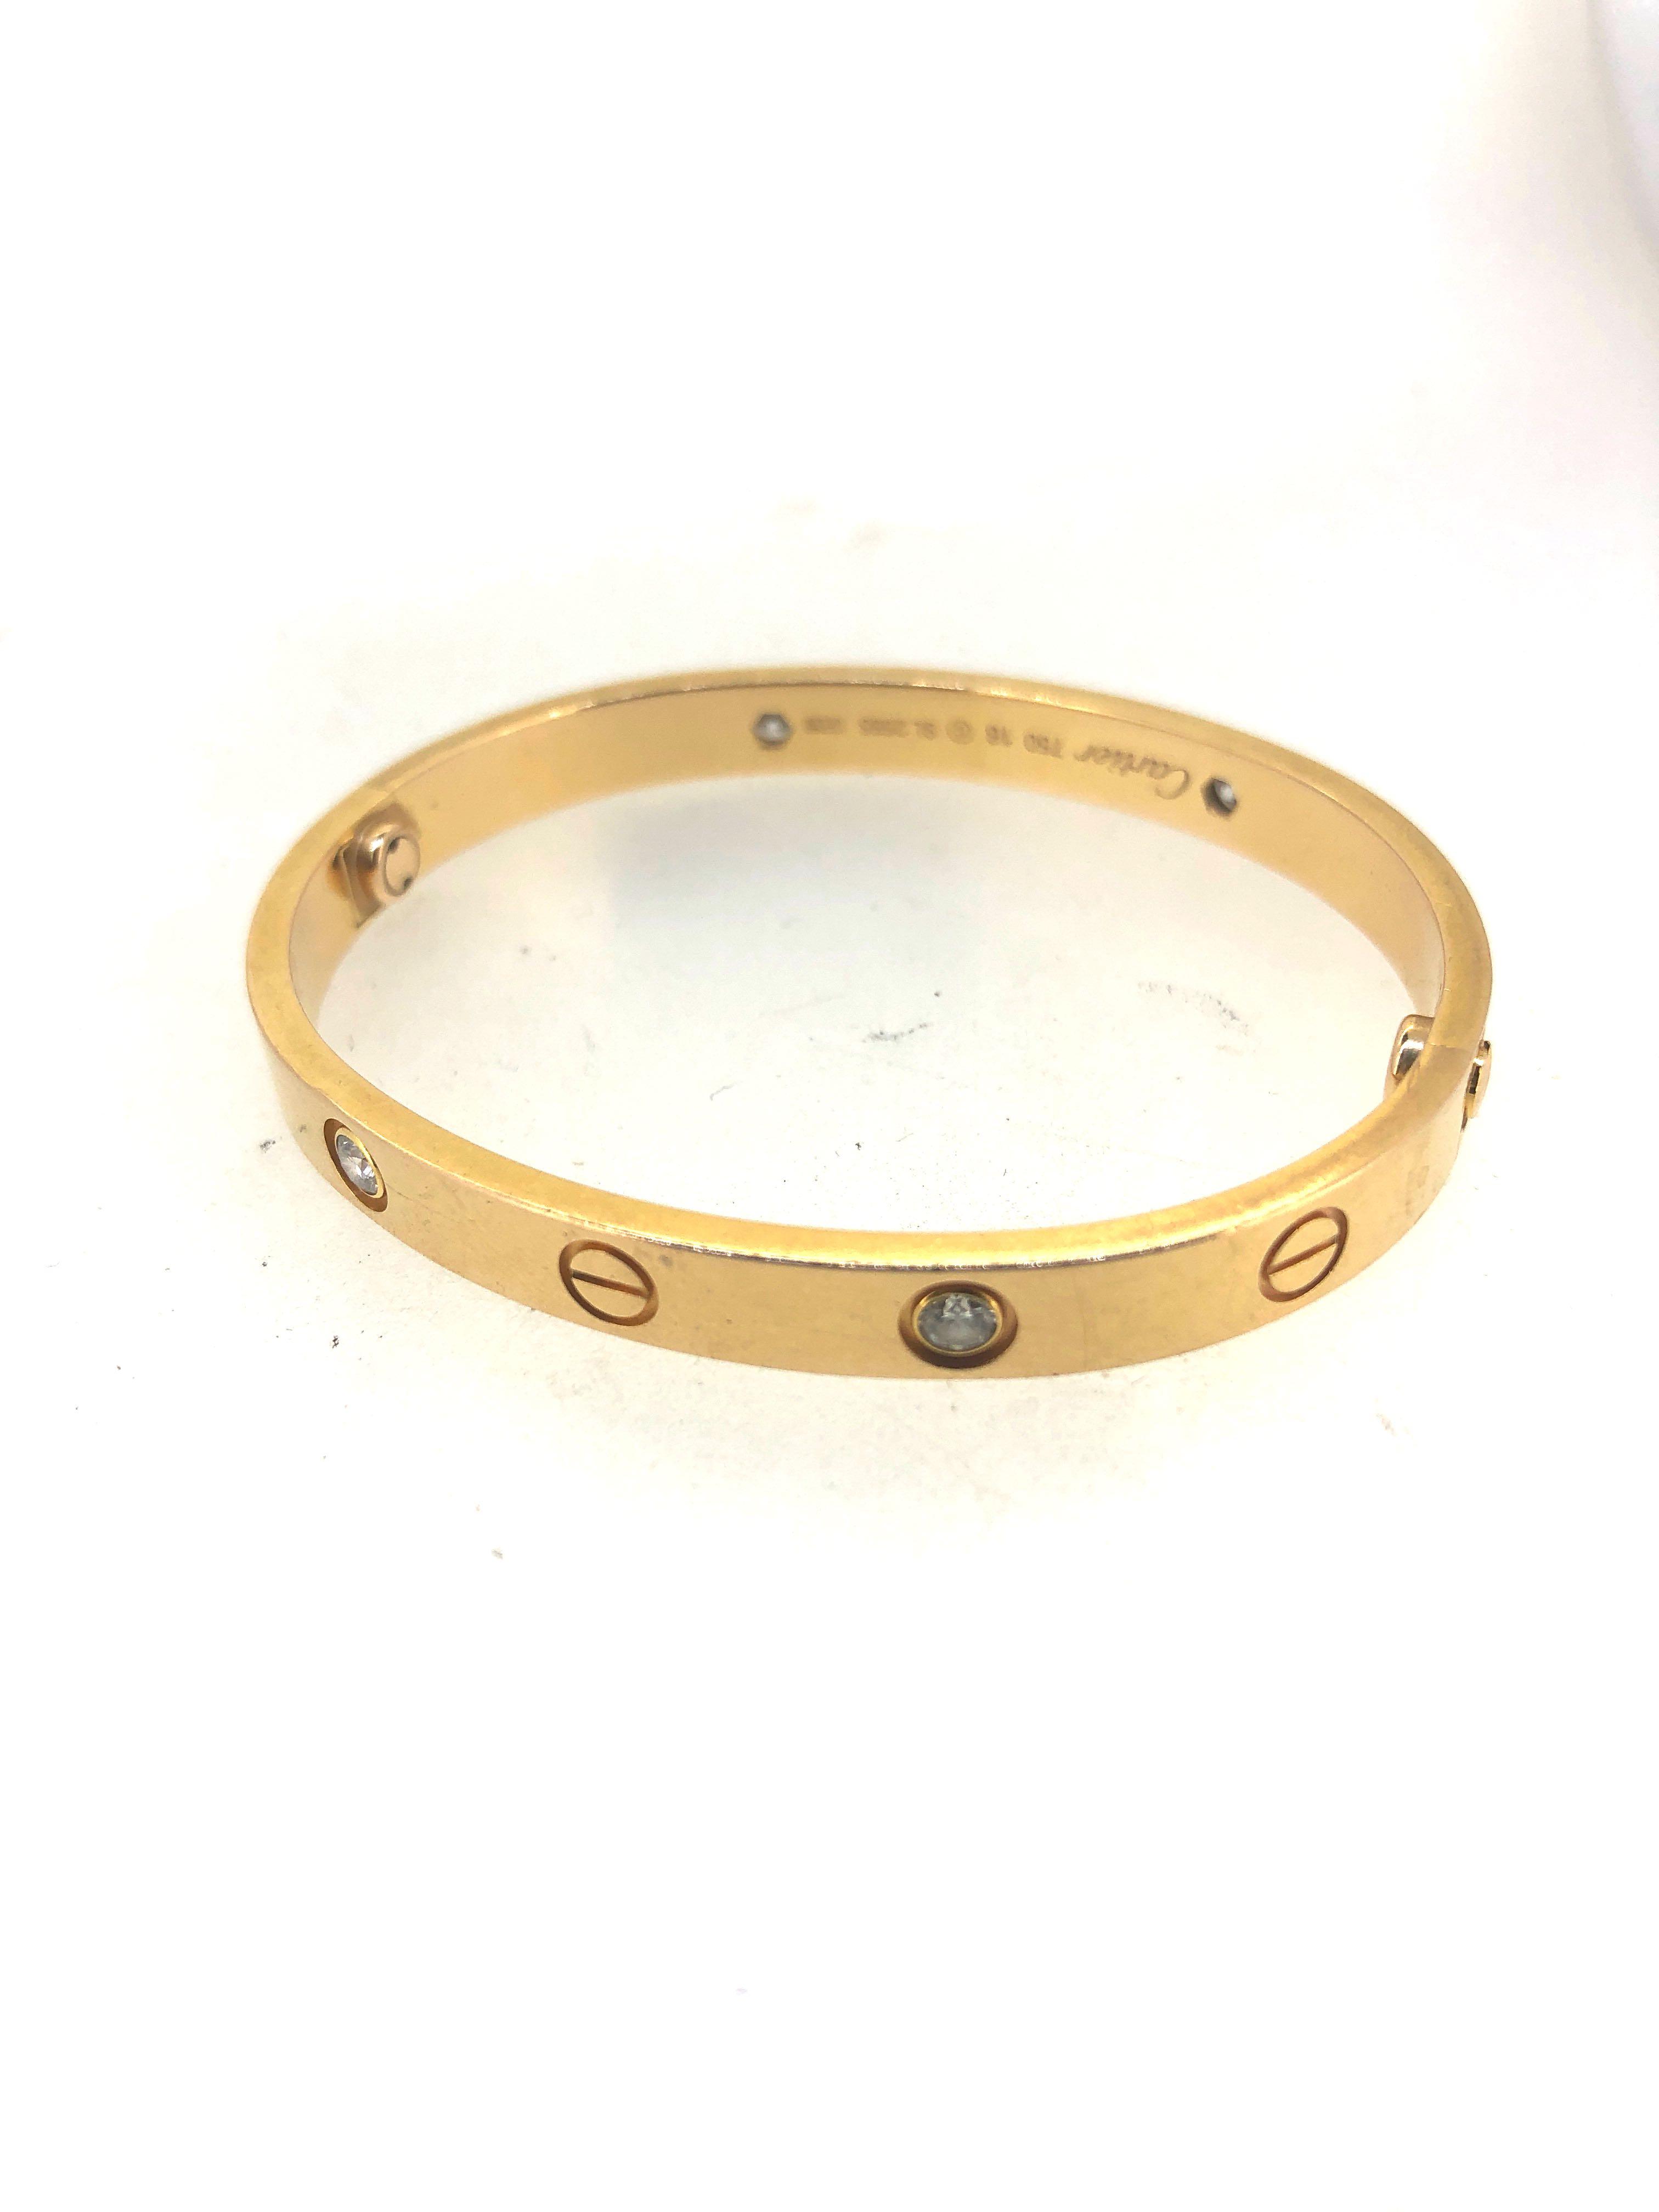 a1b052d5a1244d Cartier Love Bangle 4Dismond, Women's Fashion, Jewellery, Bracelets ...